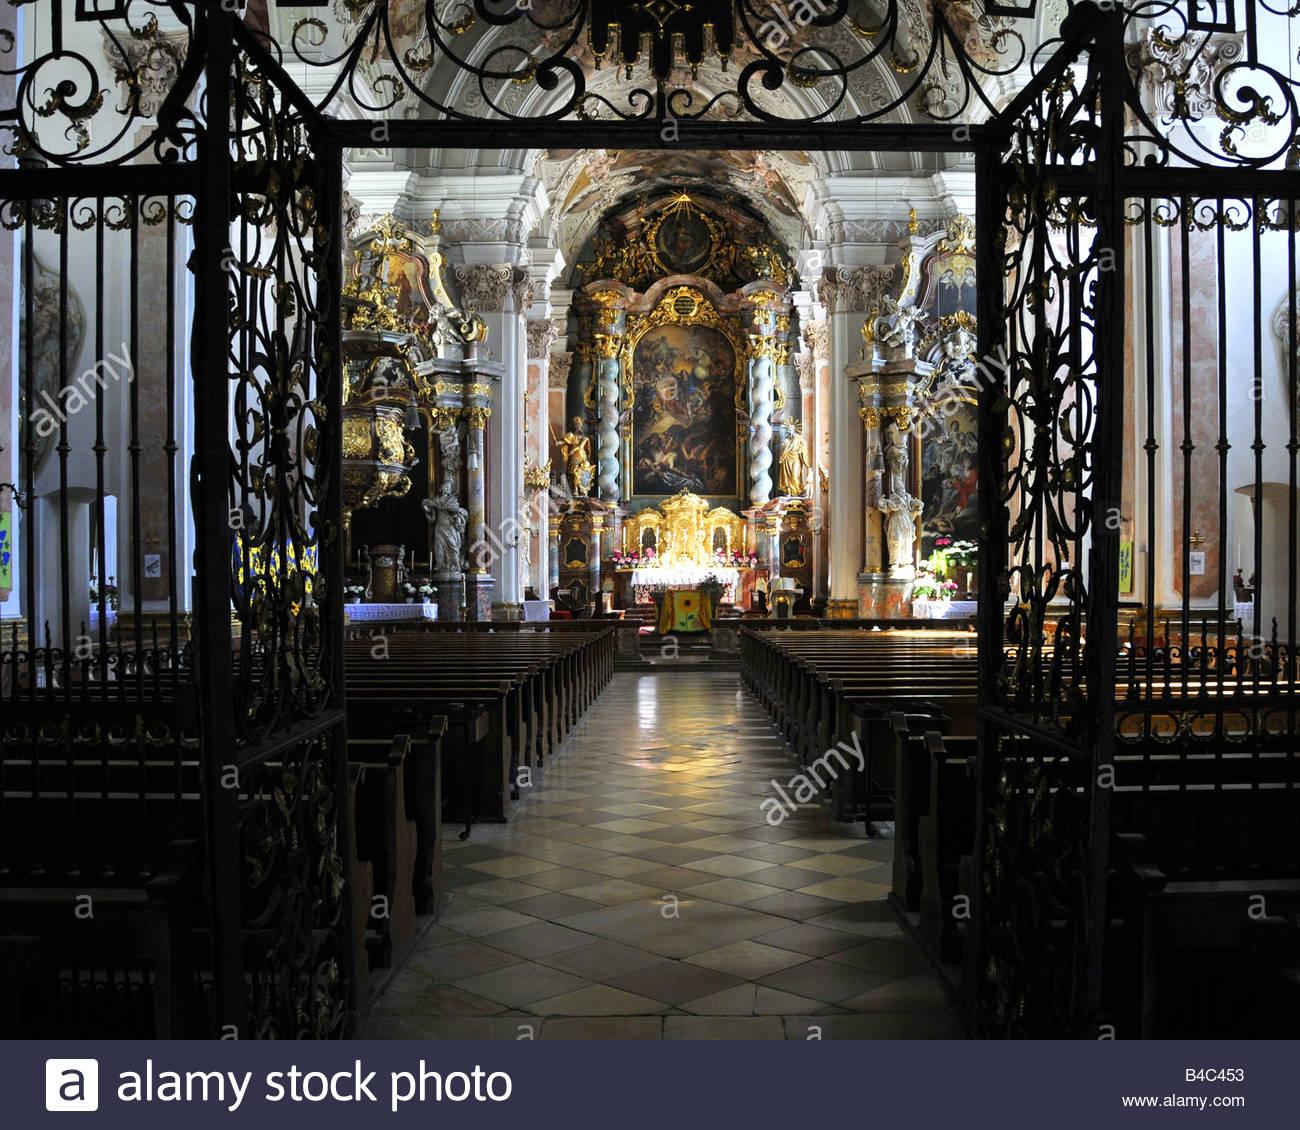 DE - LOWER BAVARIA: Interior of St. Michael's Klosterkirche at Metten (Benedictine Monastery) - Stock Image